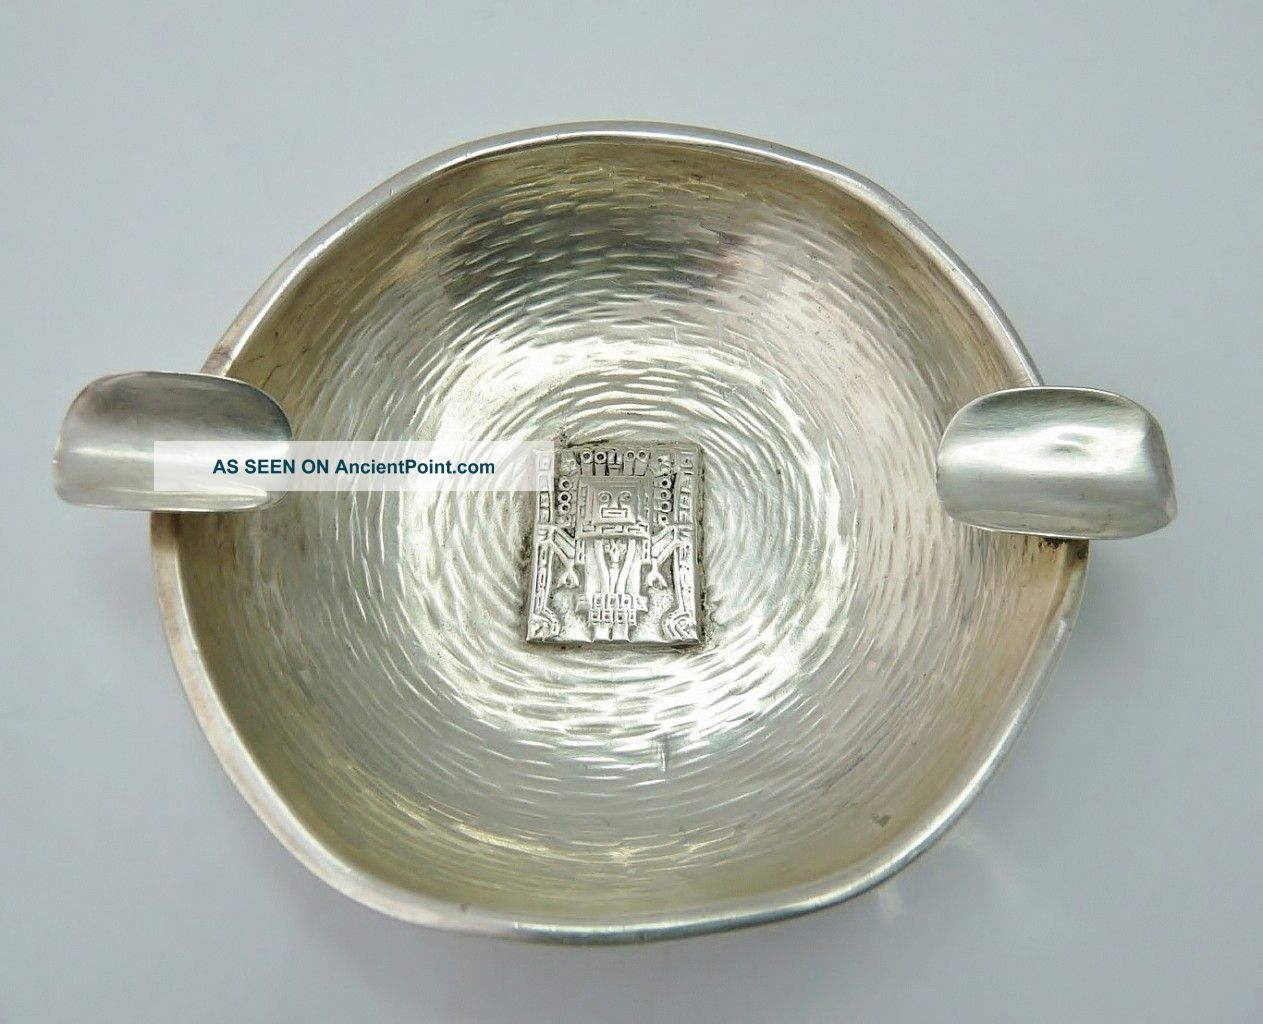 Vintage Solid Silver San Judas T Ashtray Mayan Design Ash Trays photo